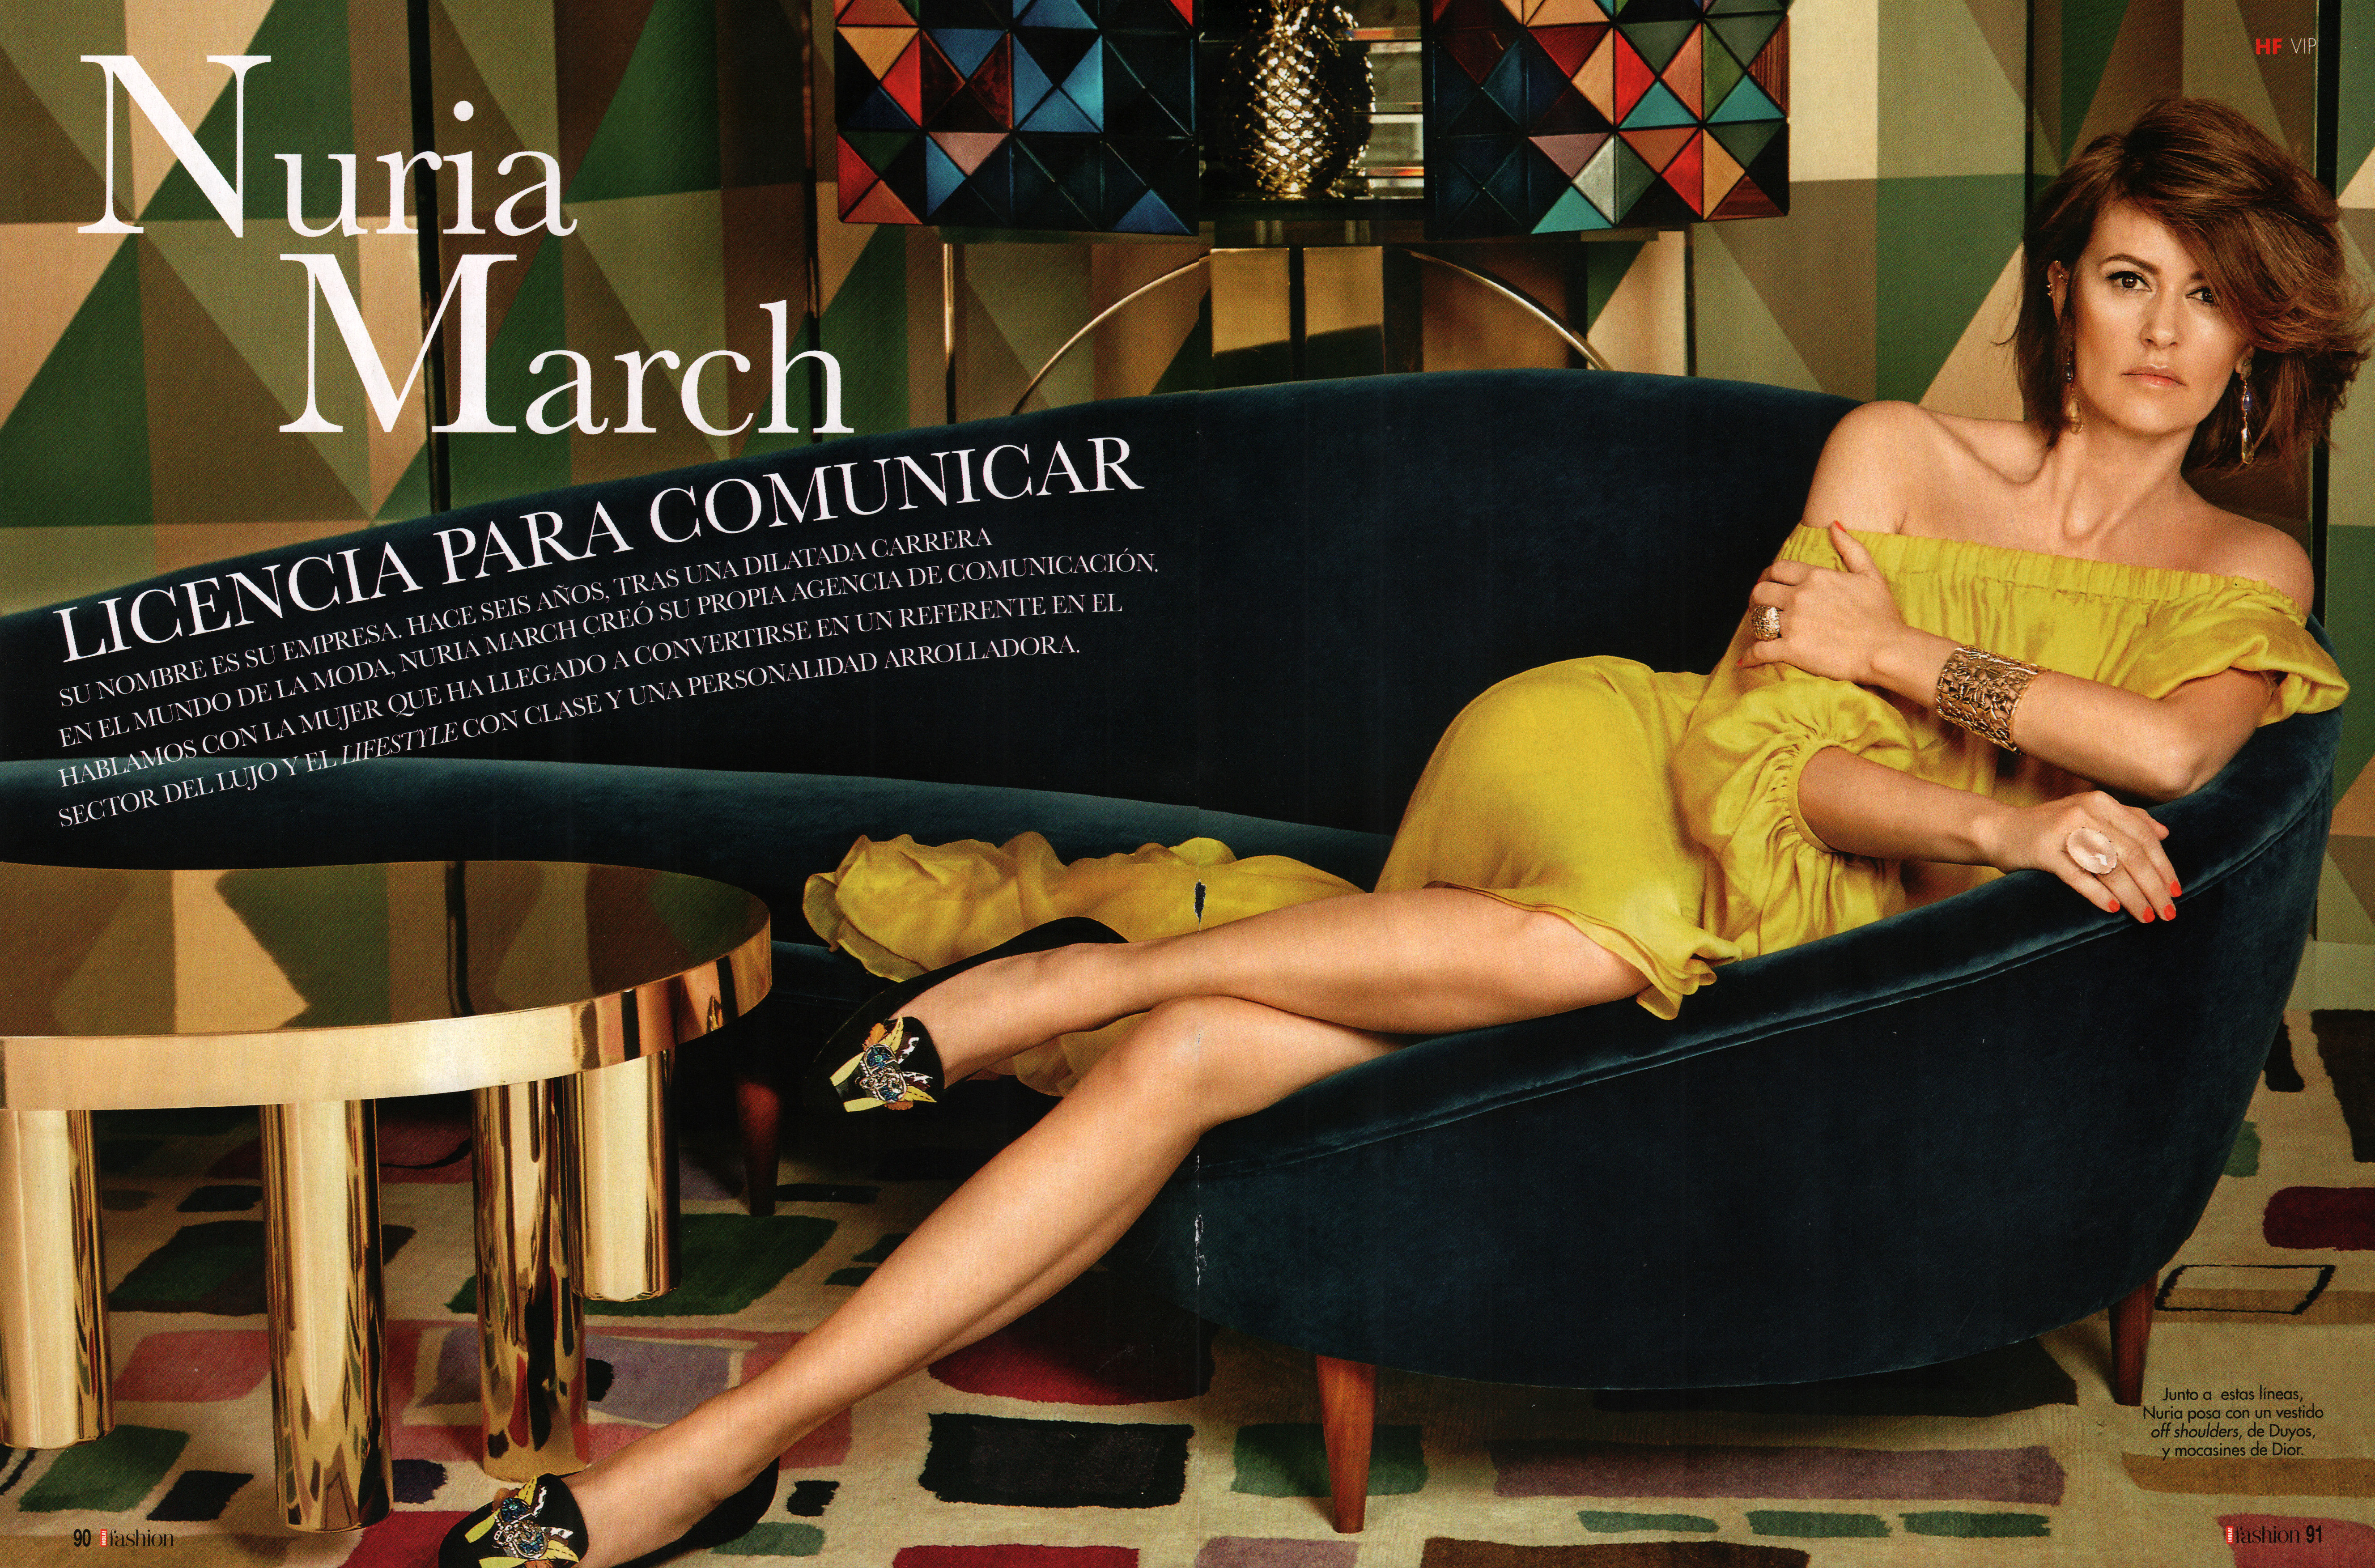 Nuria March